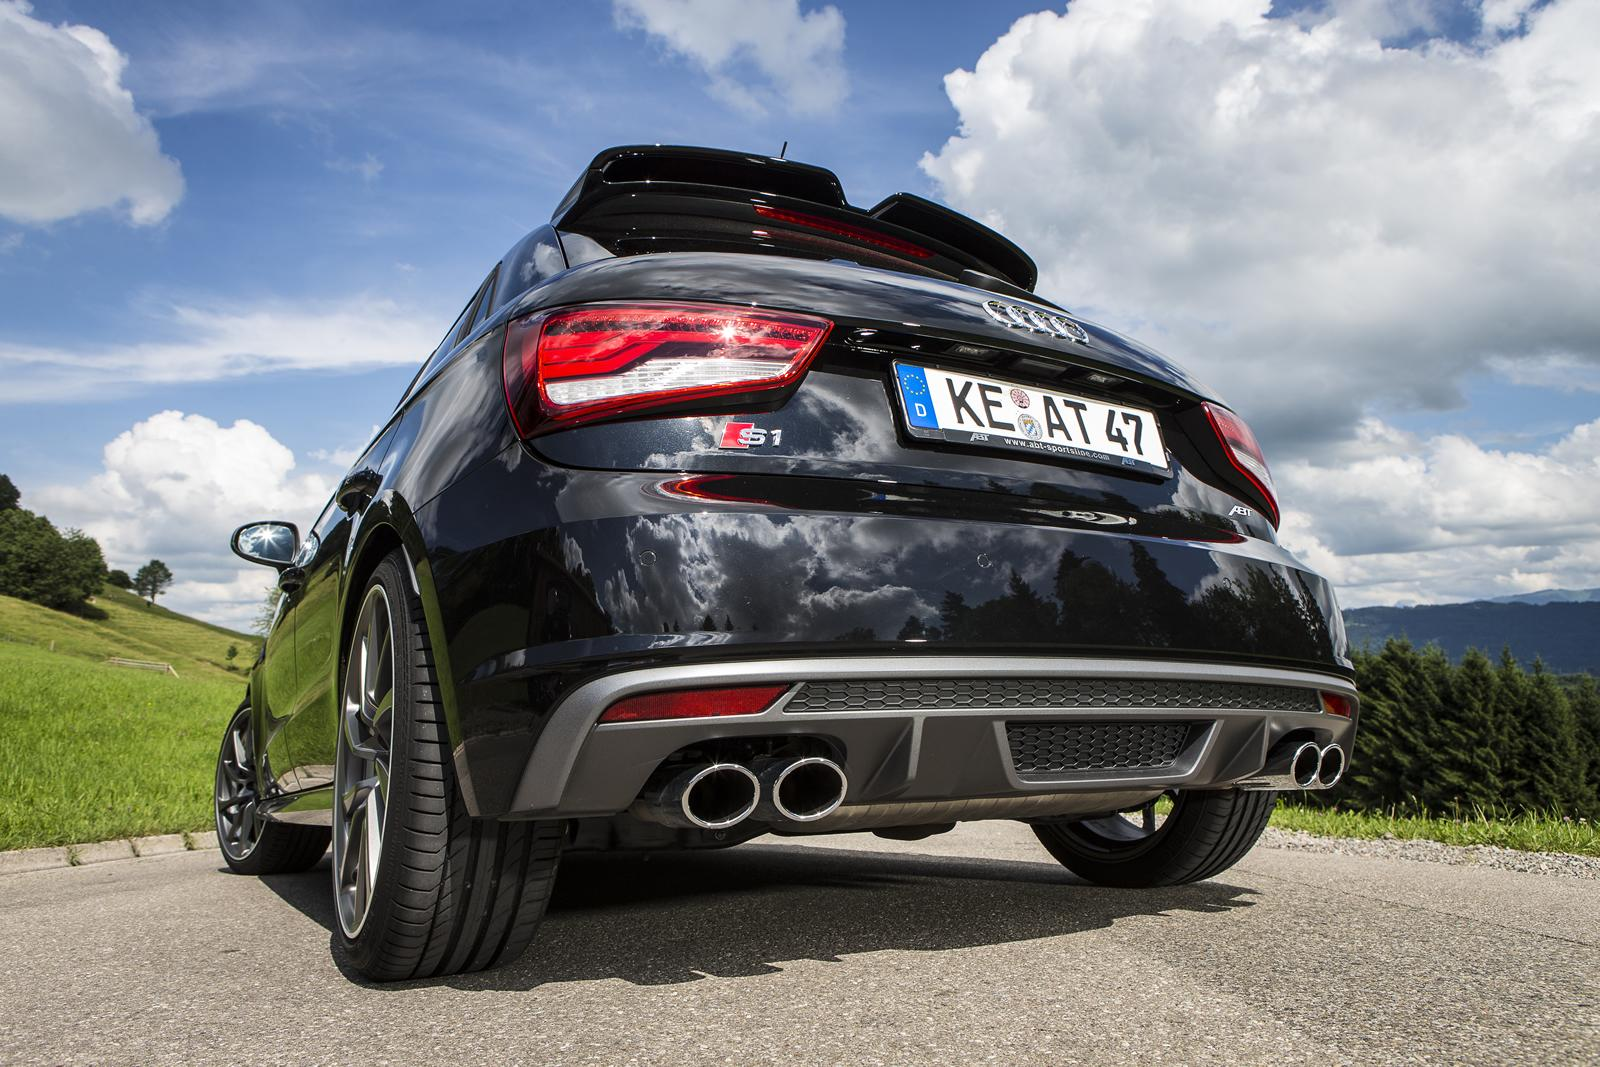 Audi S1 Sportback Abt La Rende Mostruosa Con 310 Cv